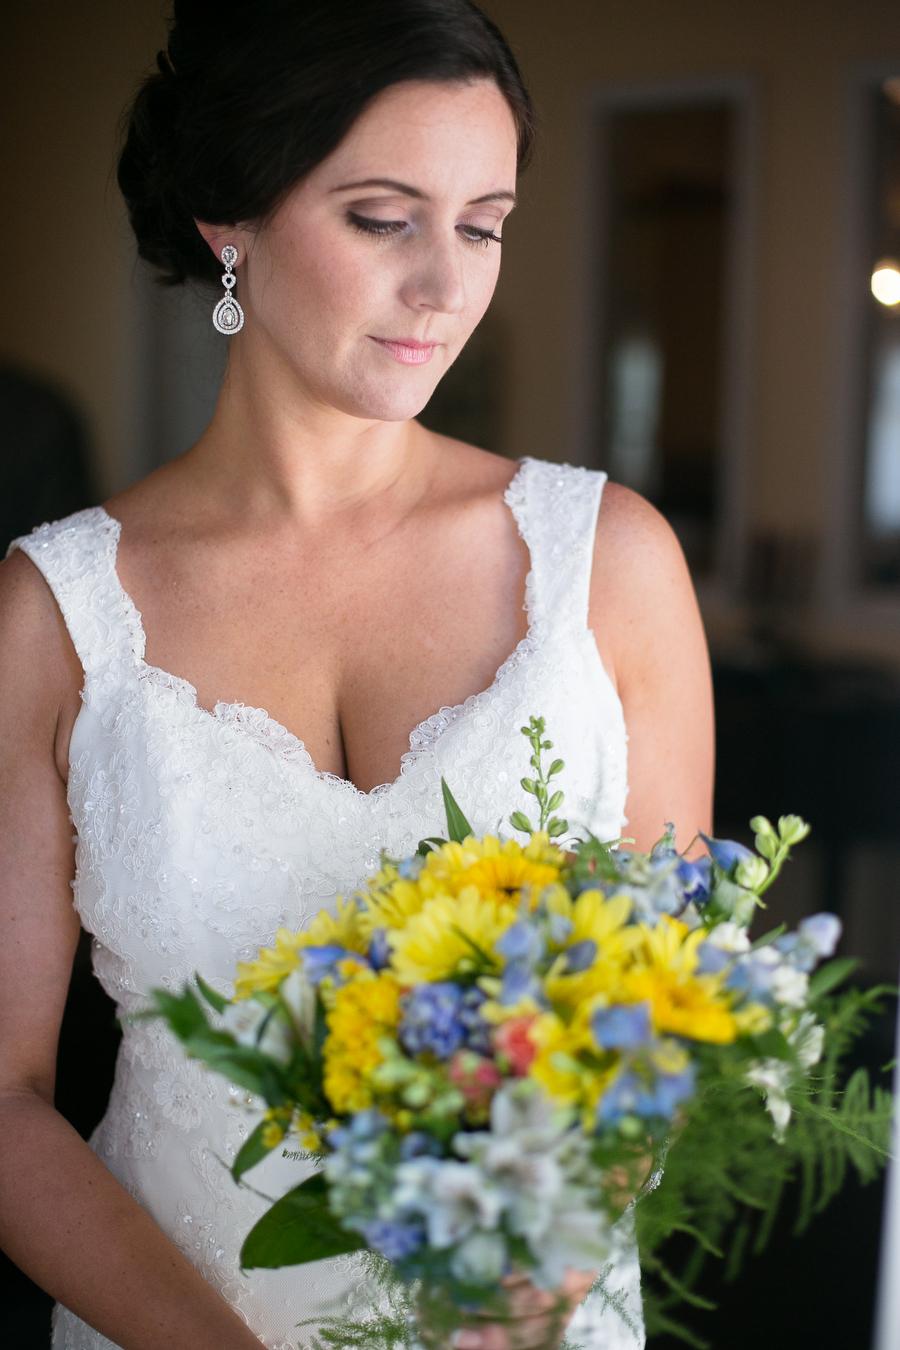 Karlo Gesner Photography Chanteclaire Farm Deep Creek Lake Lancaster Philadelphia Wedding Photographer 0013.JPG